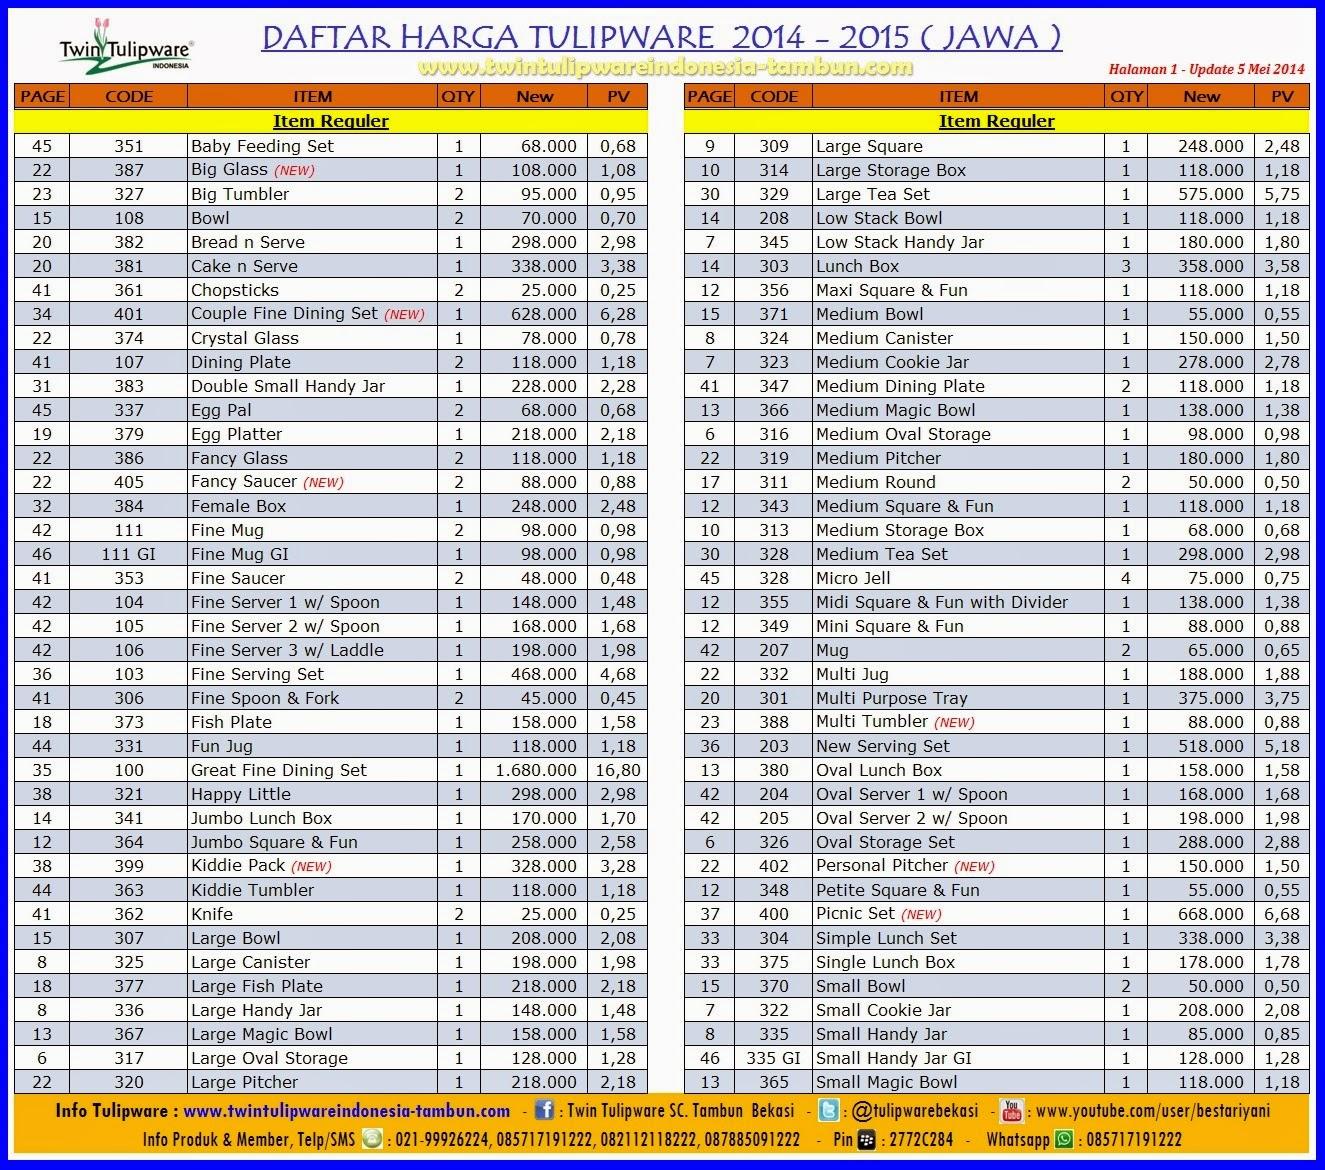 daftar harga tulipware 2014 2015 jawa twin tulipware sc tambun